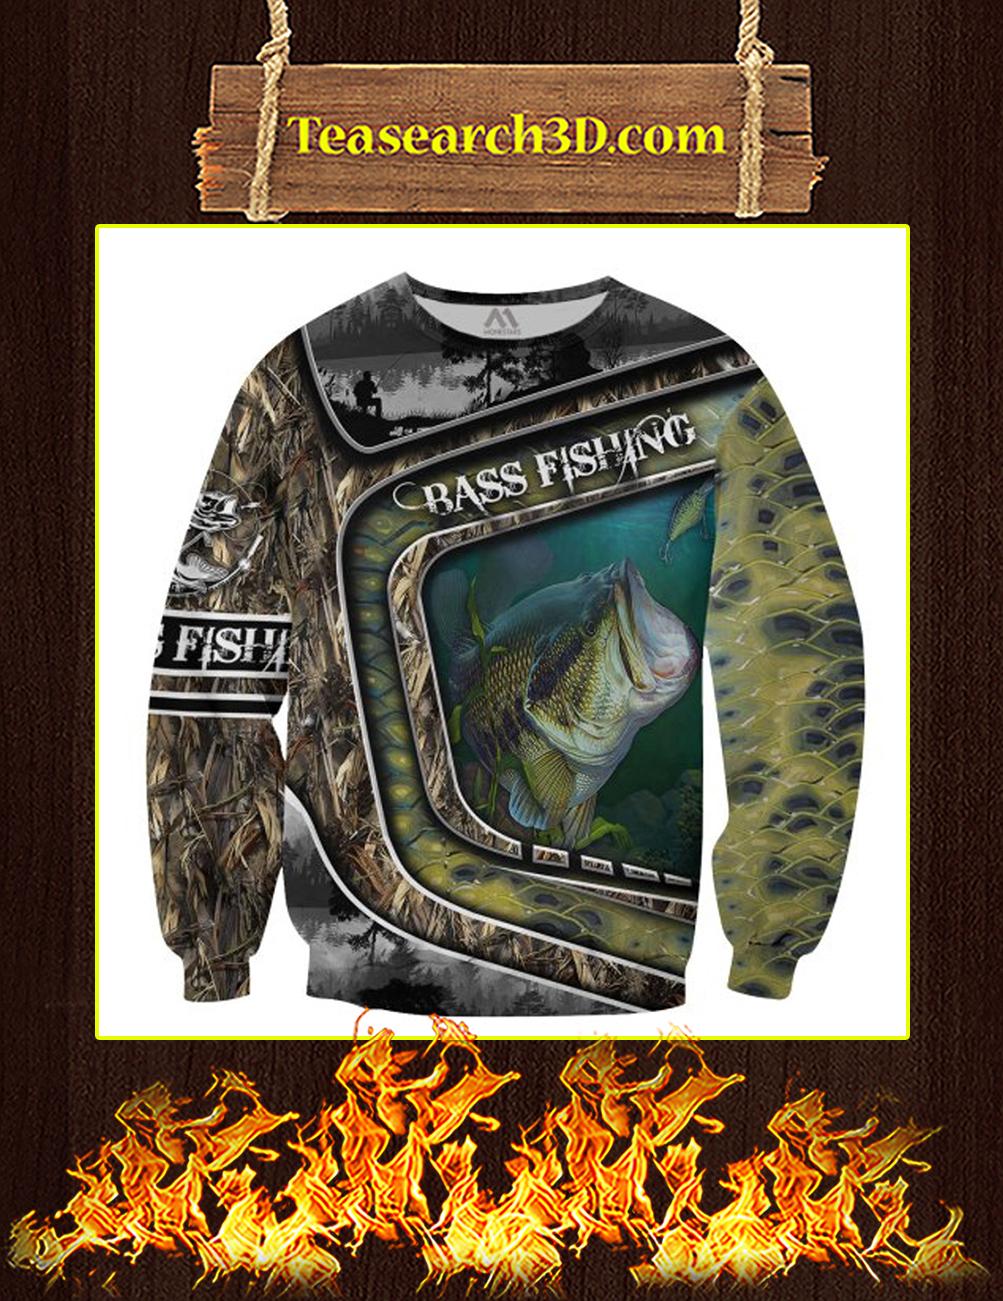 Bass Fishing Camo 3D All Over Printed Sweatshirt